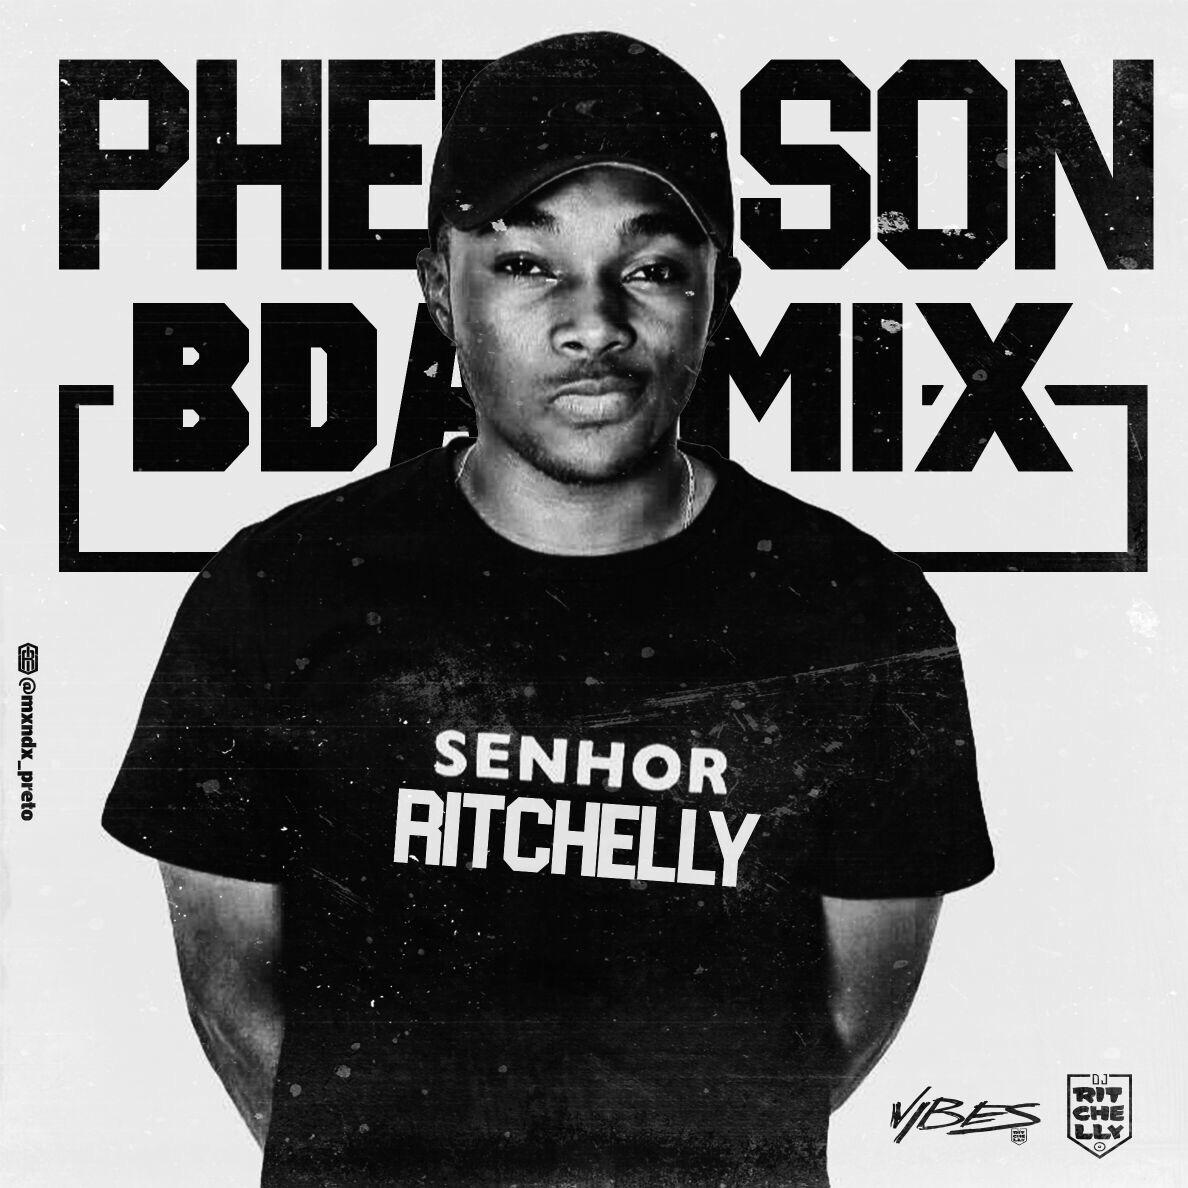 PHEDILSON